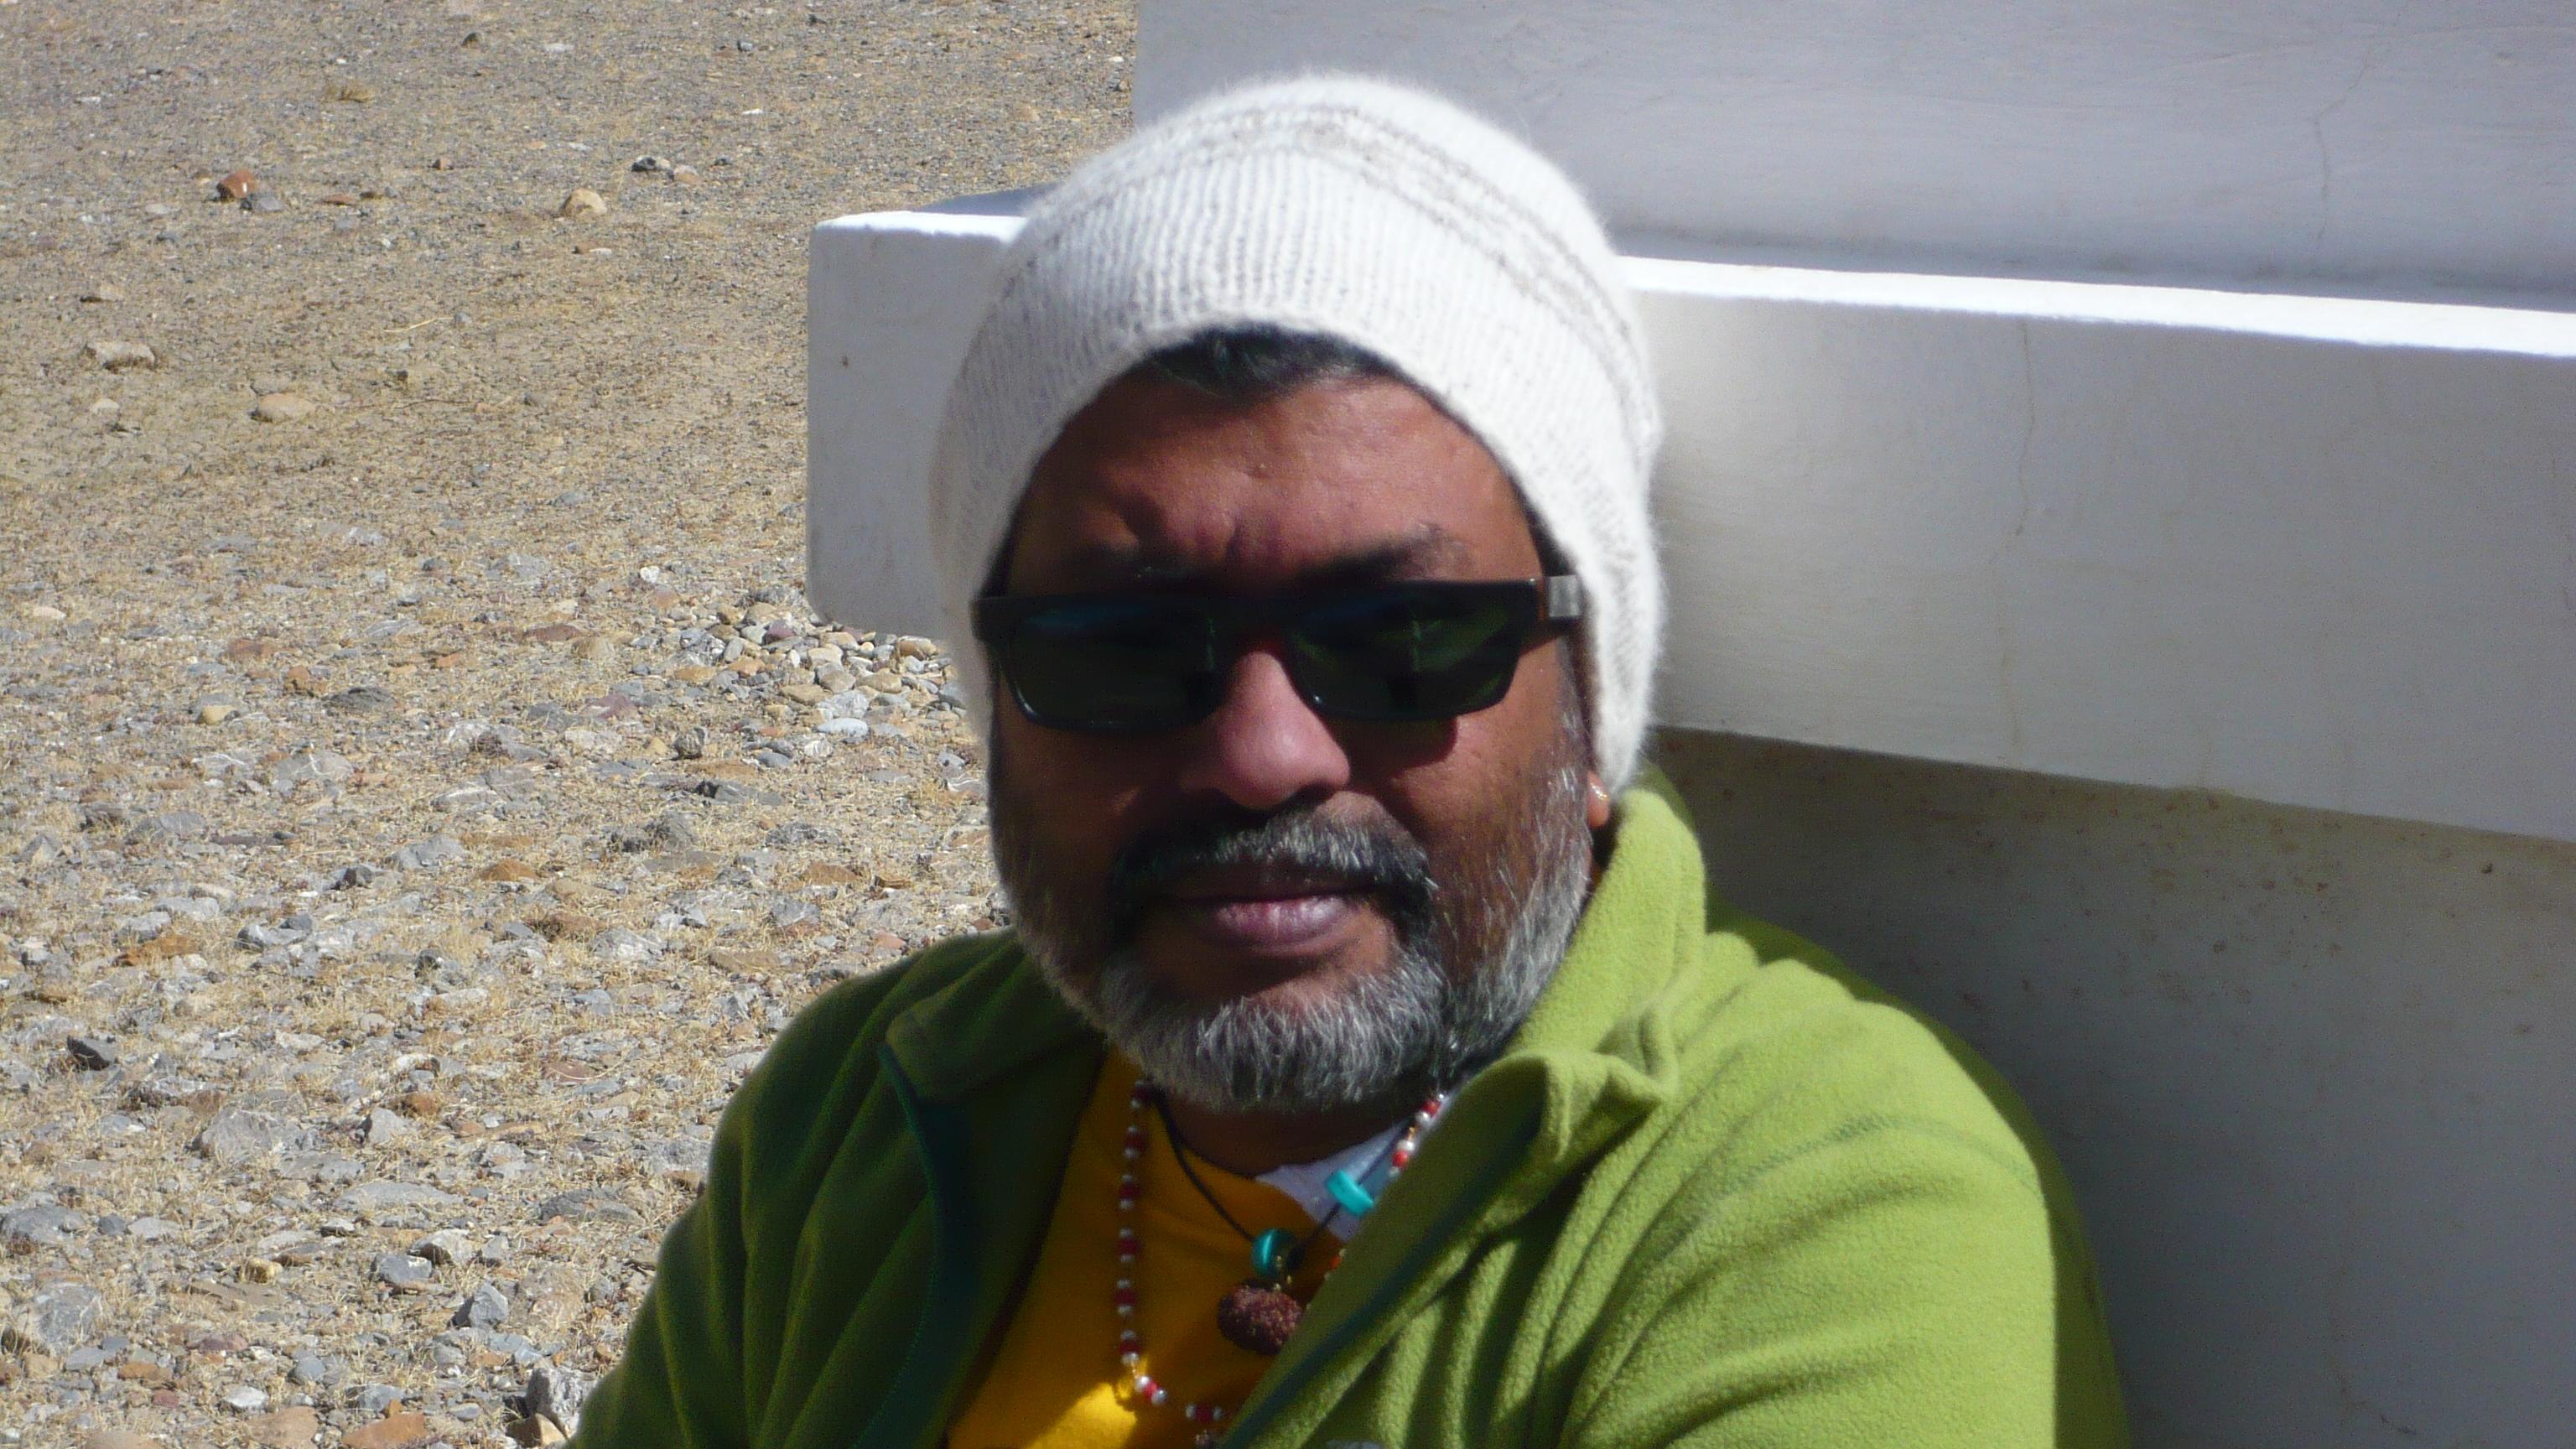 Image of Abul Kalam Azad from Wikidata